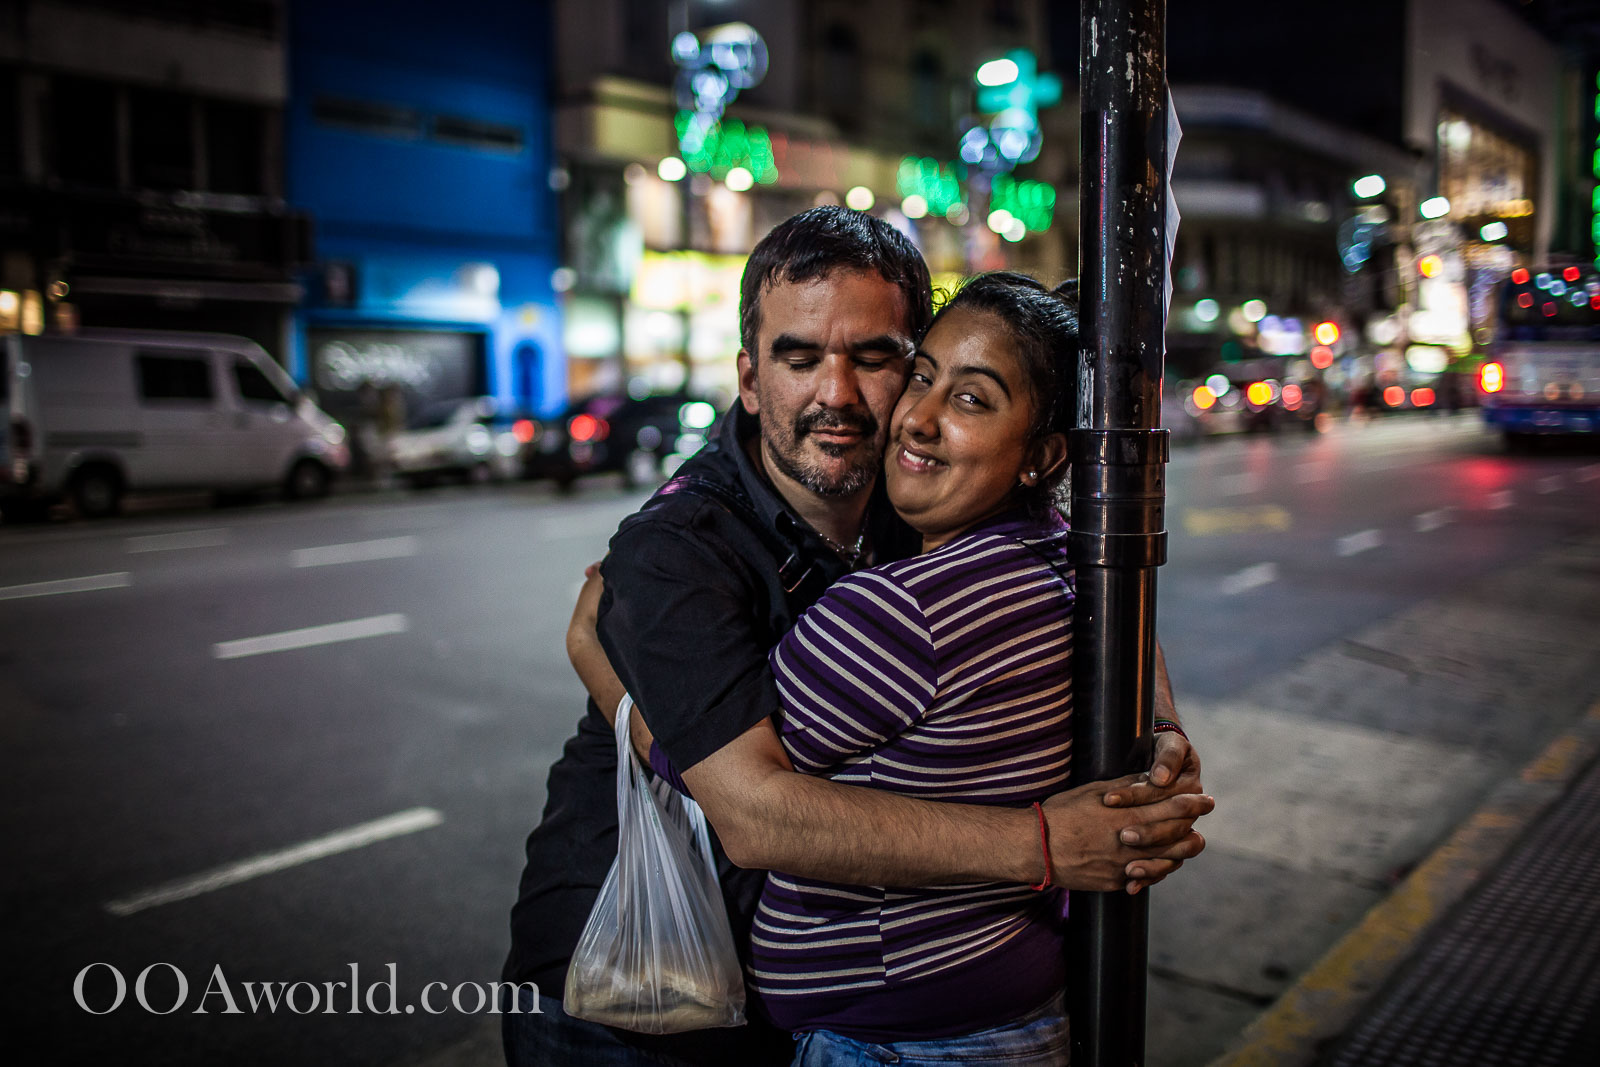 Sweet Love Buenos Aires Photos Avenida Corrientes Ooaworld